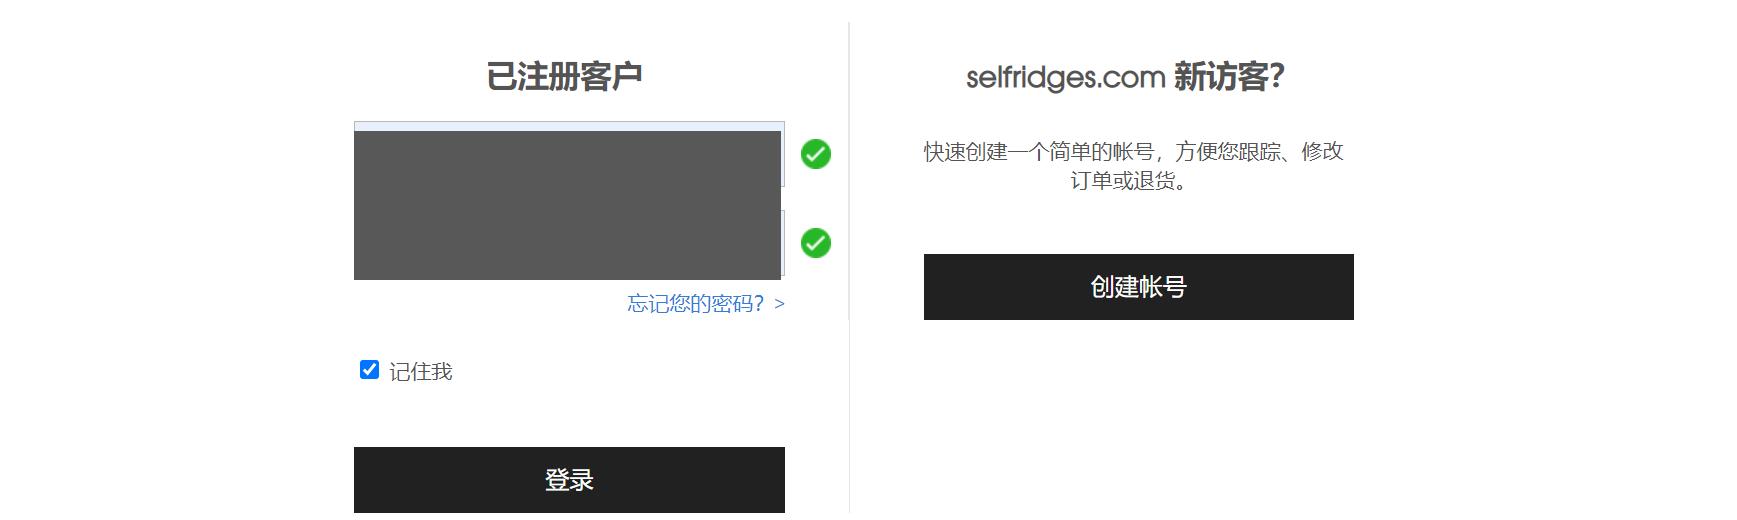 Selfridges 註冊教學